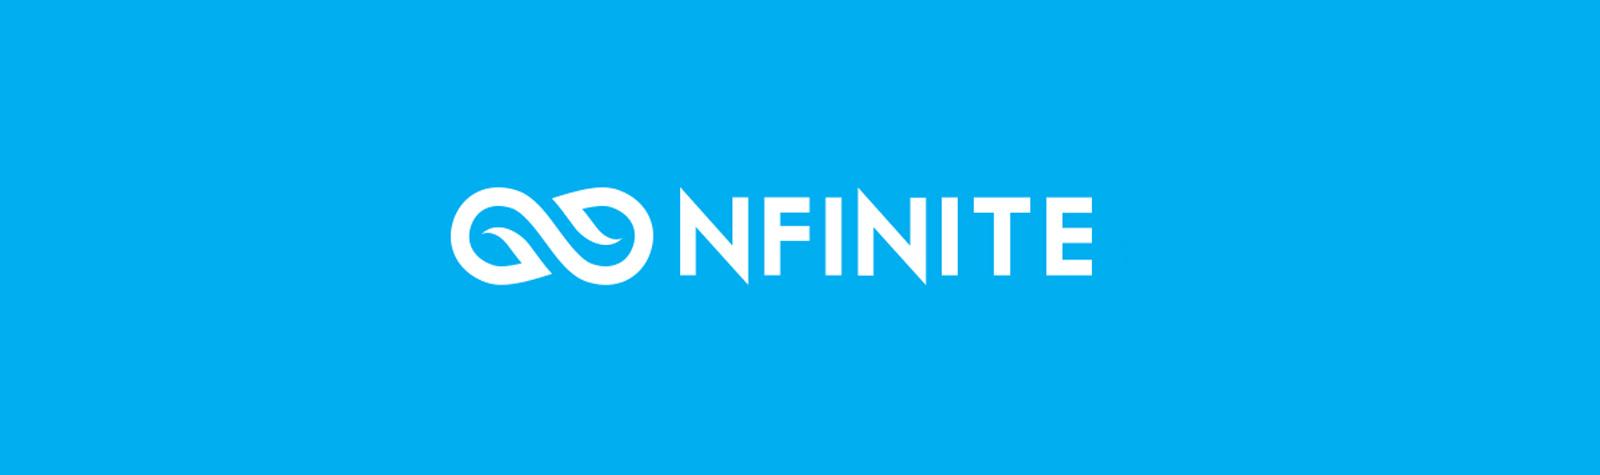 Nfinite Announce Halo Roster